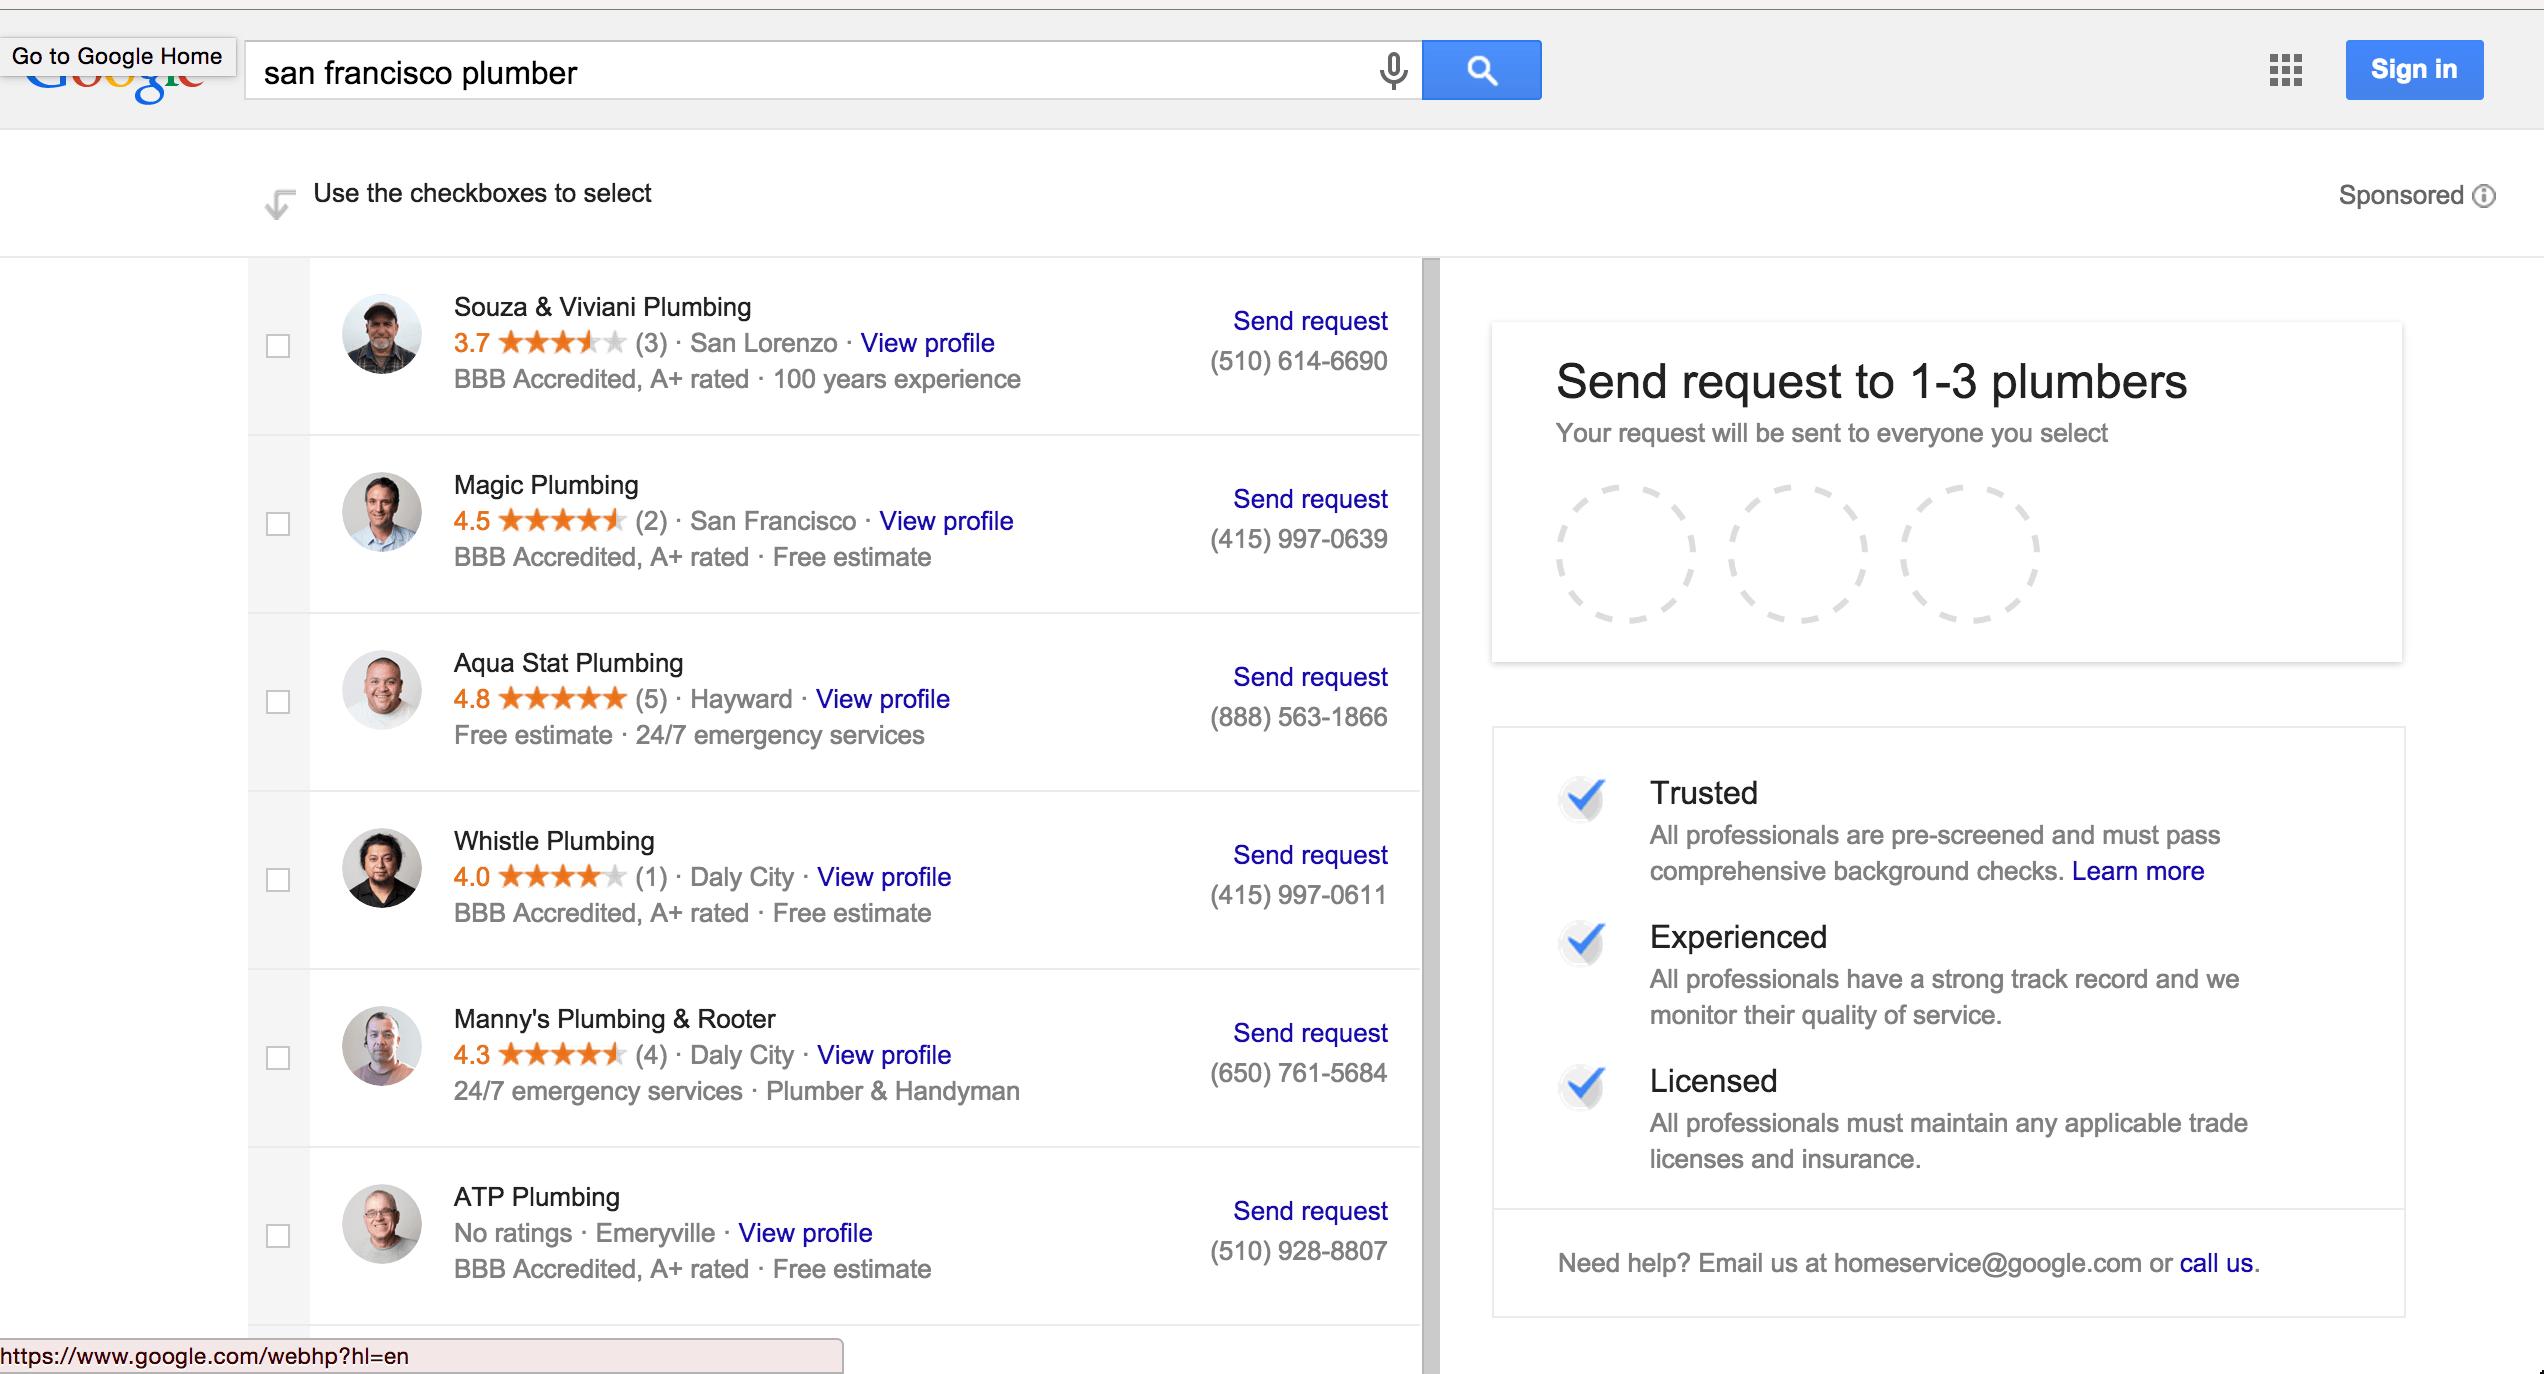 Google lead capture